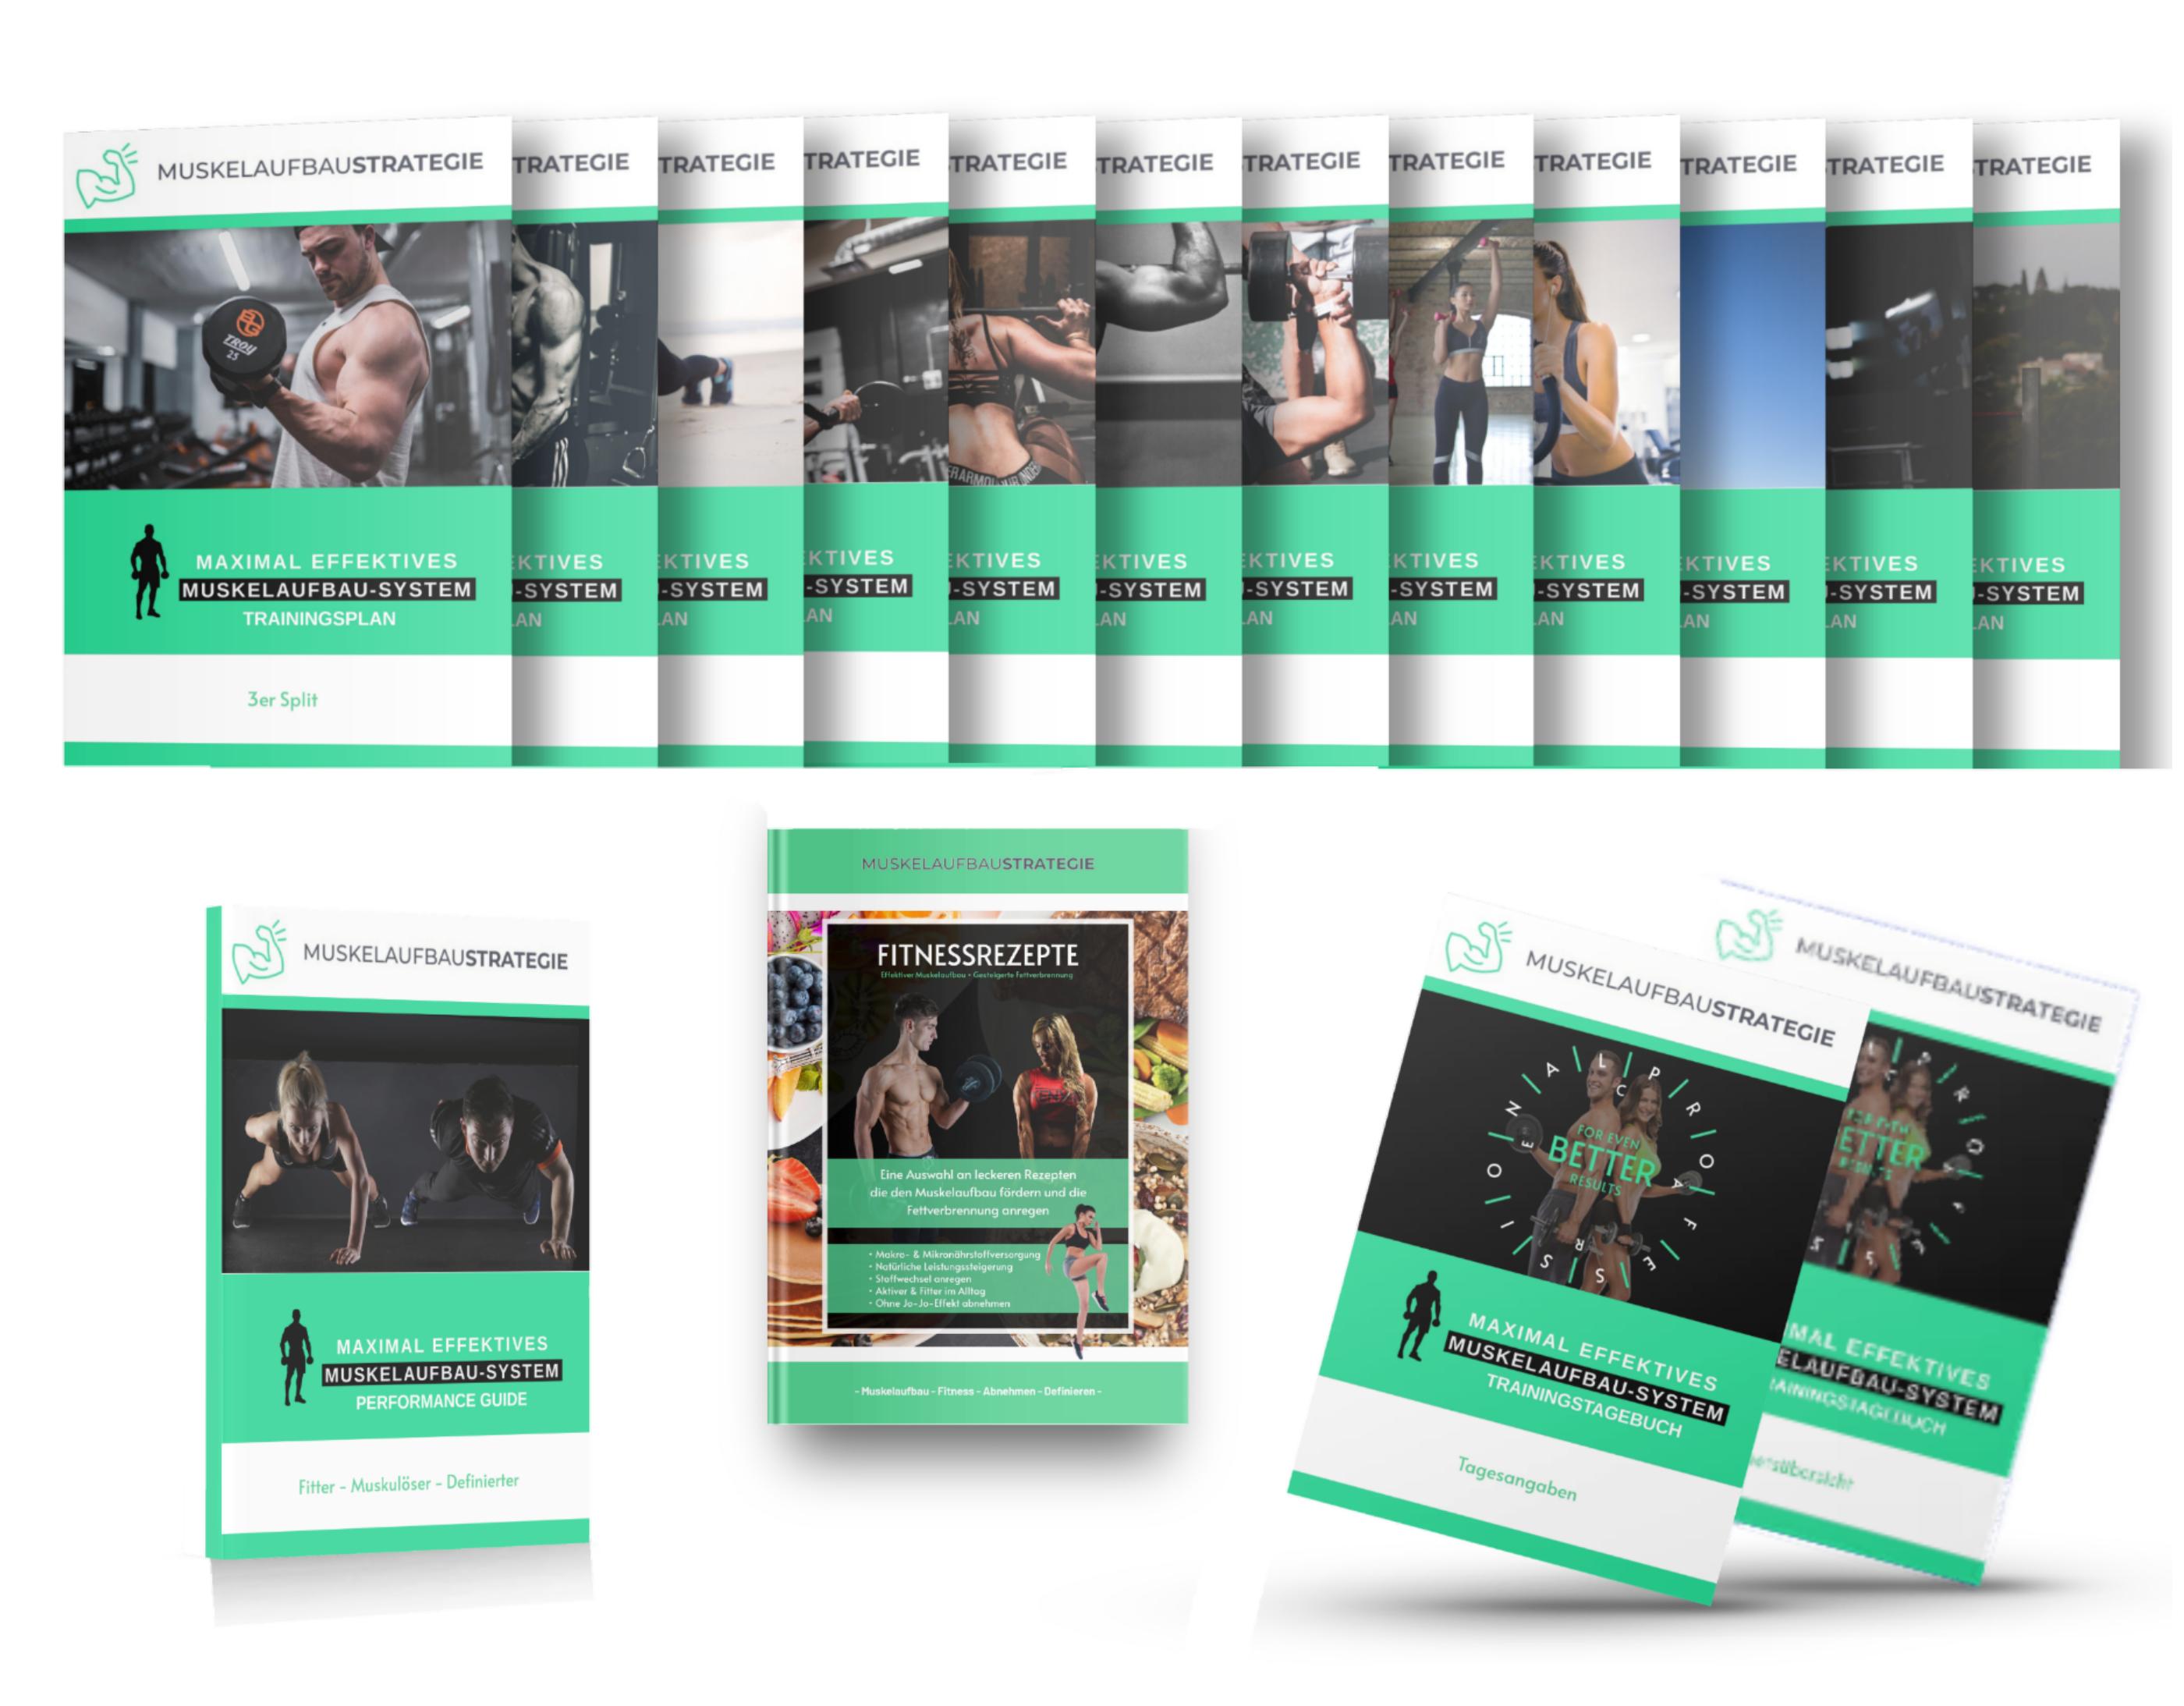 Produktbild, Muskelaufbau, Trainingsprogramm